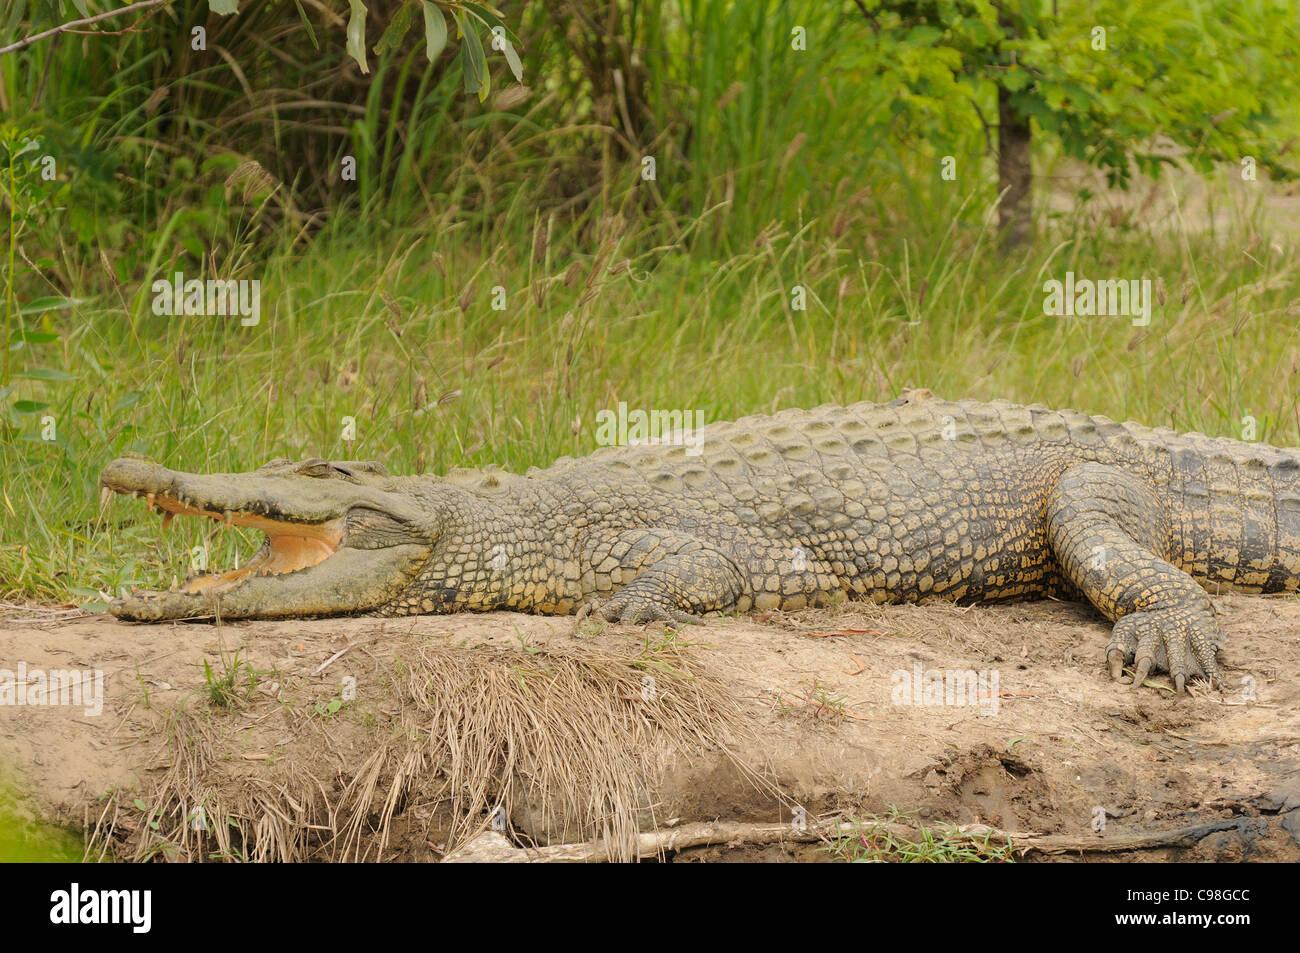 Saltwater (Estuarine) Crocodile, Photographed near Kakadu National Park, Northern Territory, Australia - Stock Image